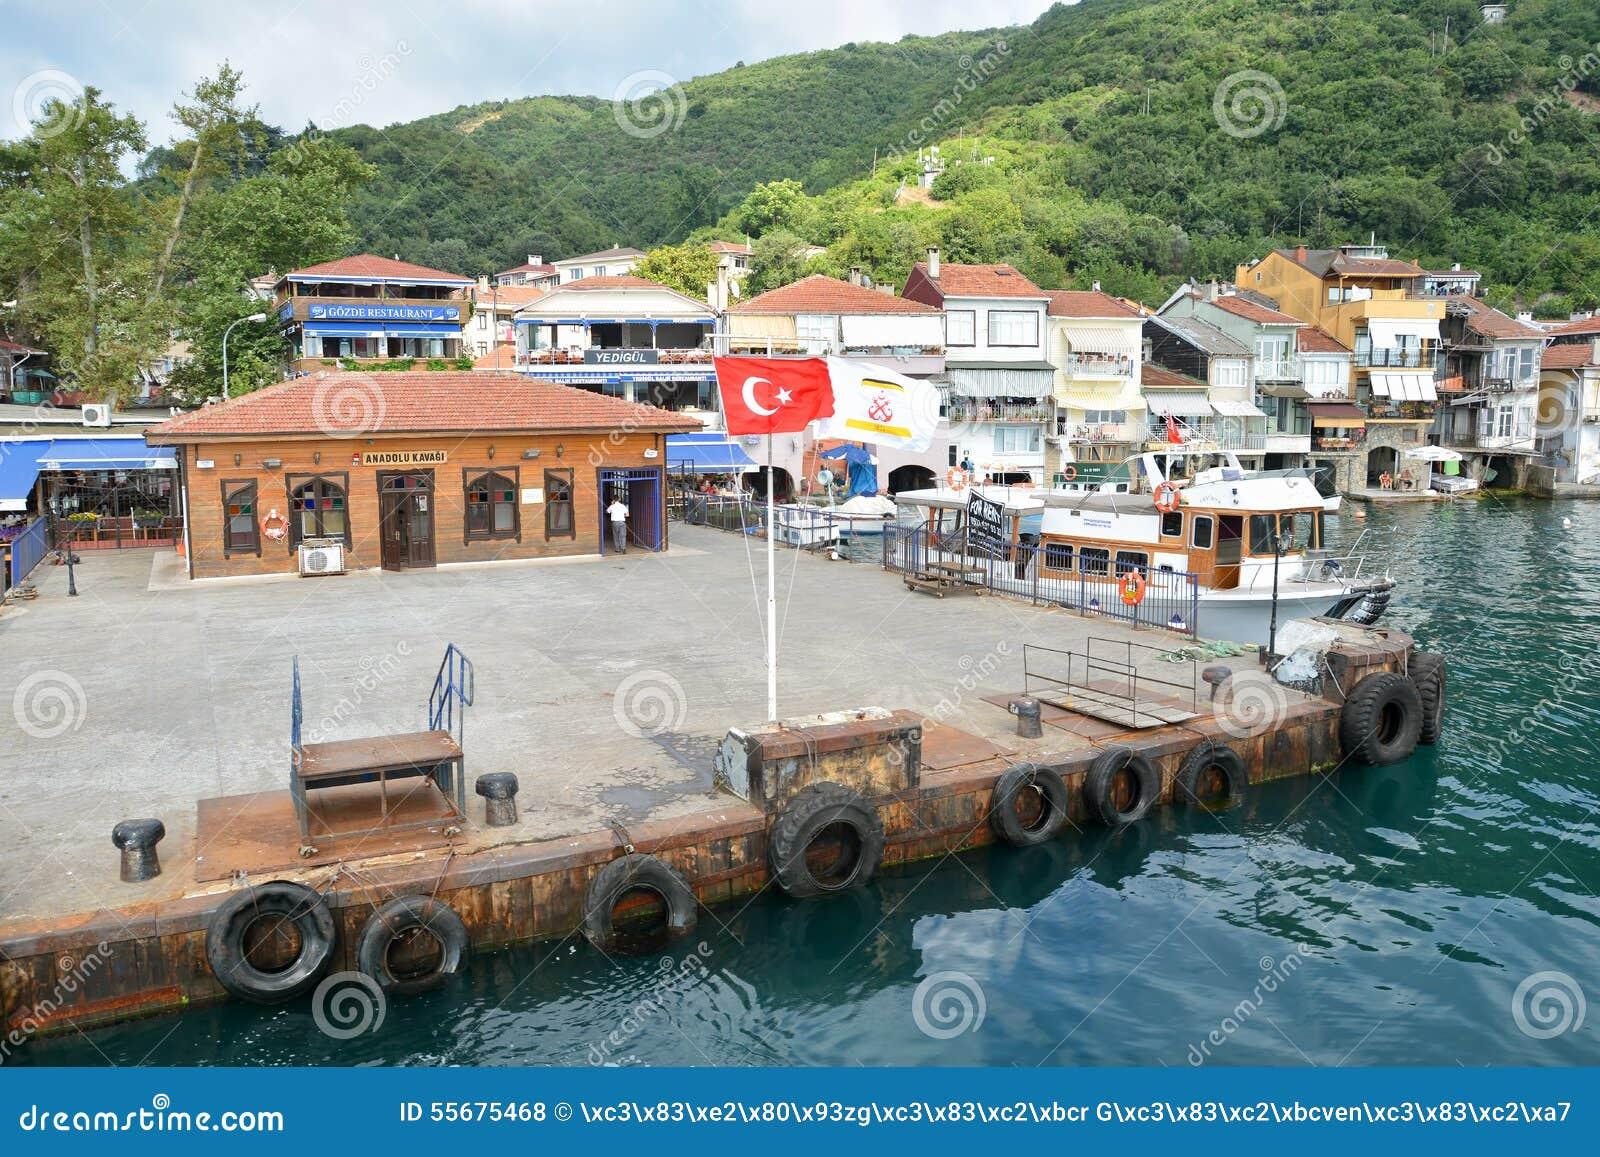 Pier Of Anadolu Kavagi, Istanbul, Turkey Editorial Stock ...